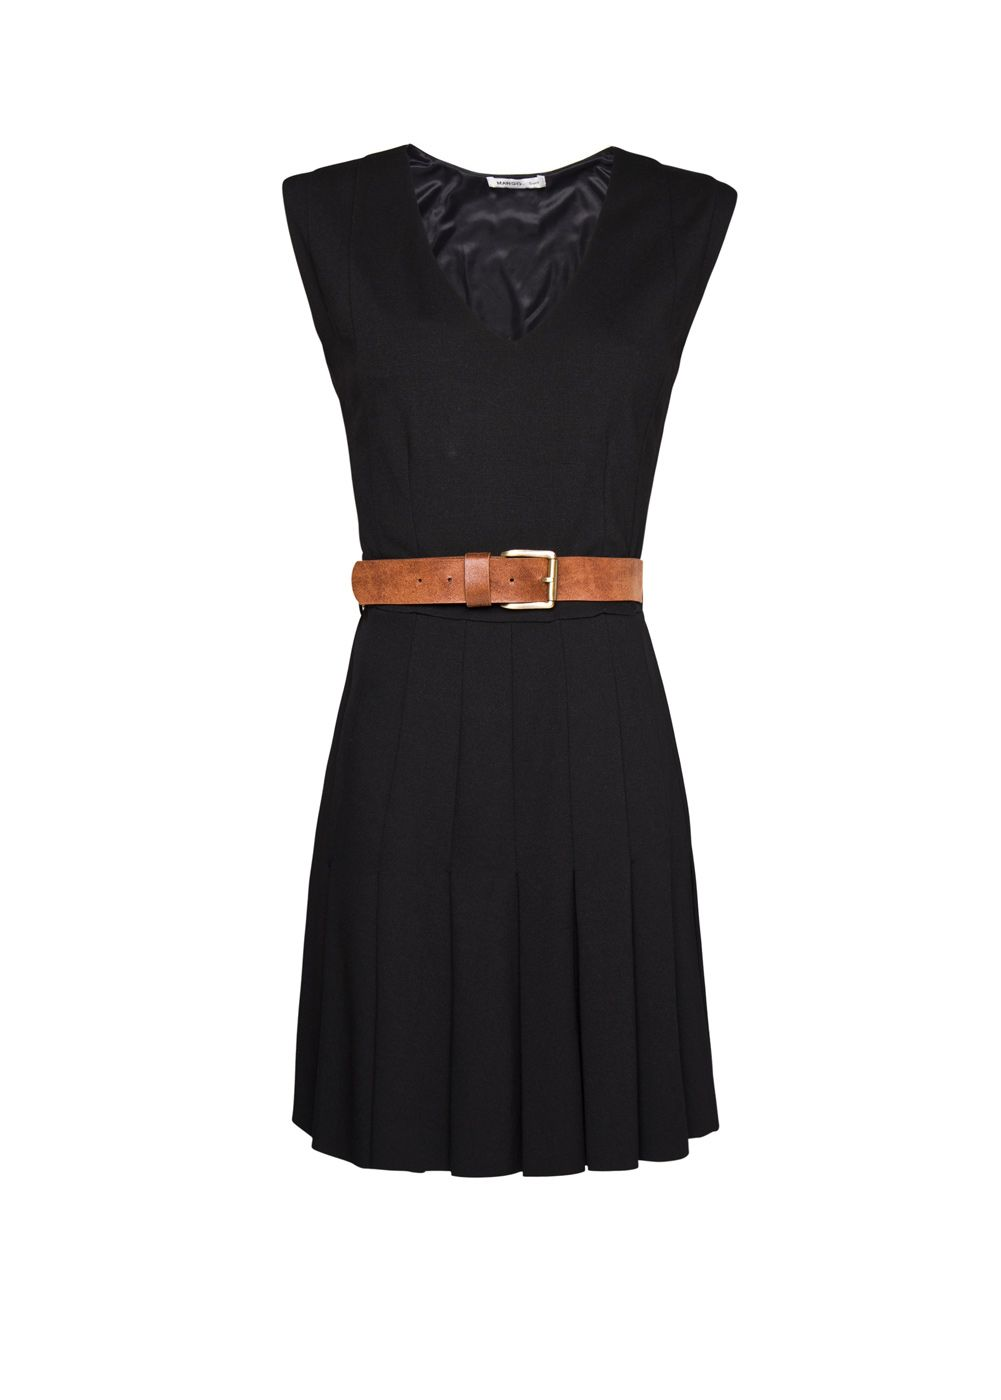 Pleated skirt dress - Women   Lbd, Minimal and Wardrobes e6de1dcdf7